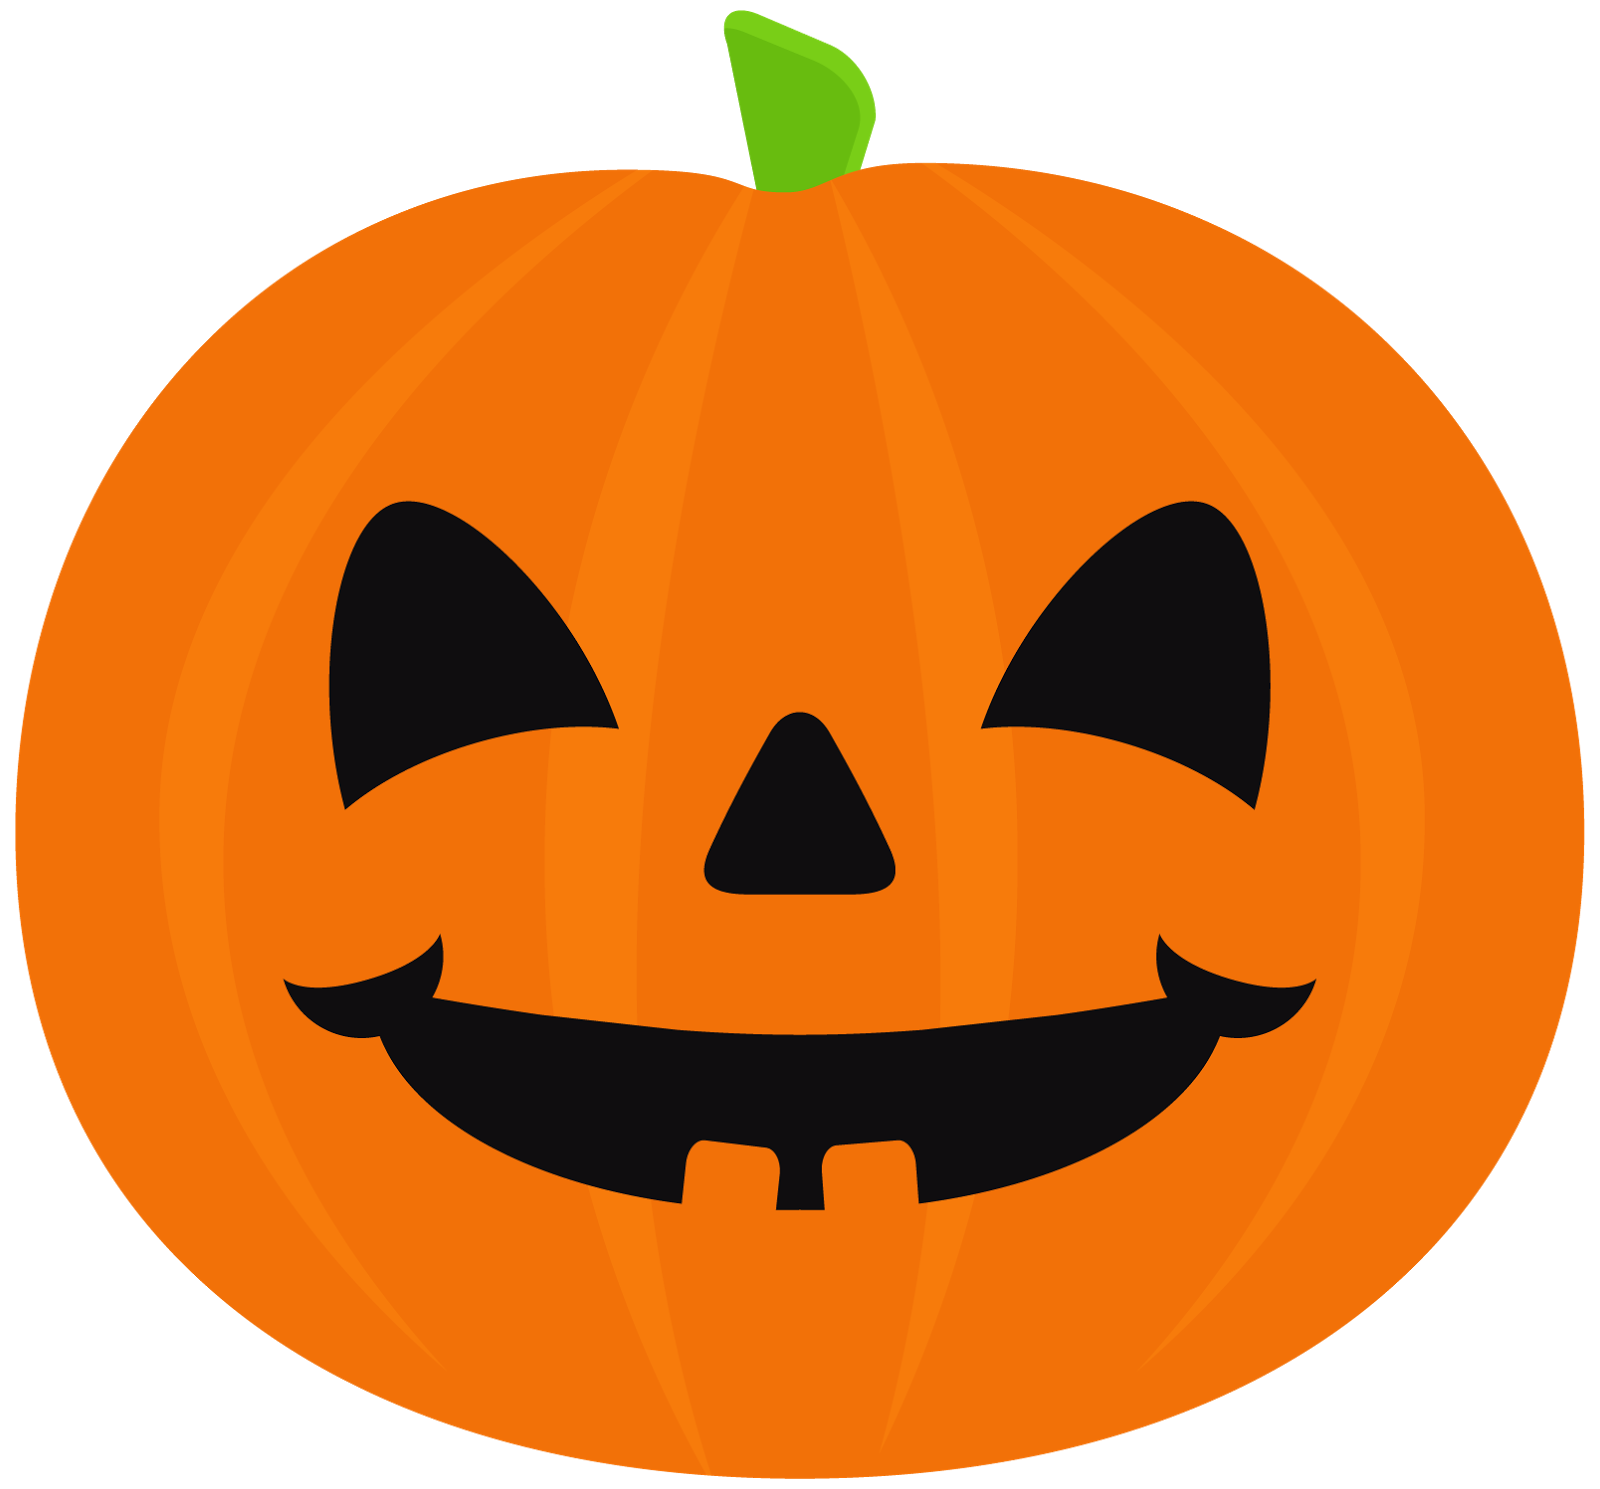 Halloween Pumpkin Clipart. | Oh My Fiesta! in english